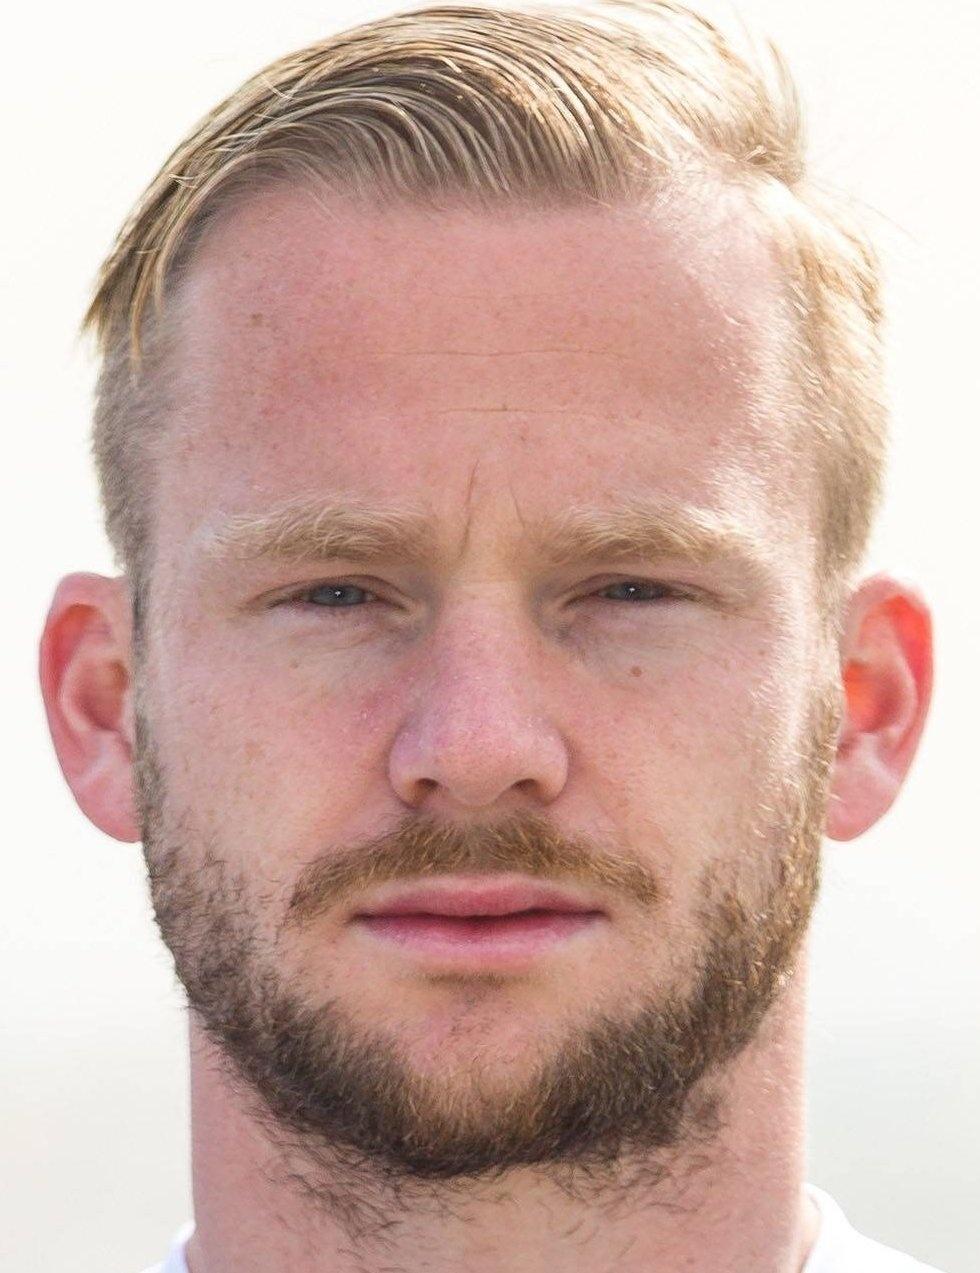 Melvin Platje - Spelersprofiel 2019 | Transfermarkt